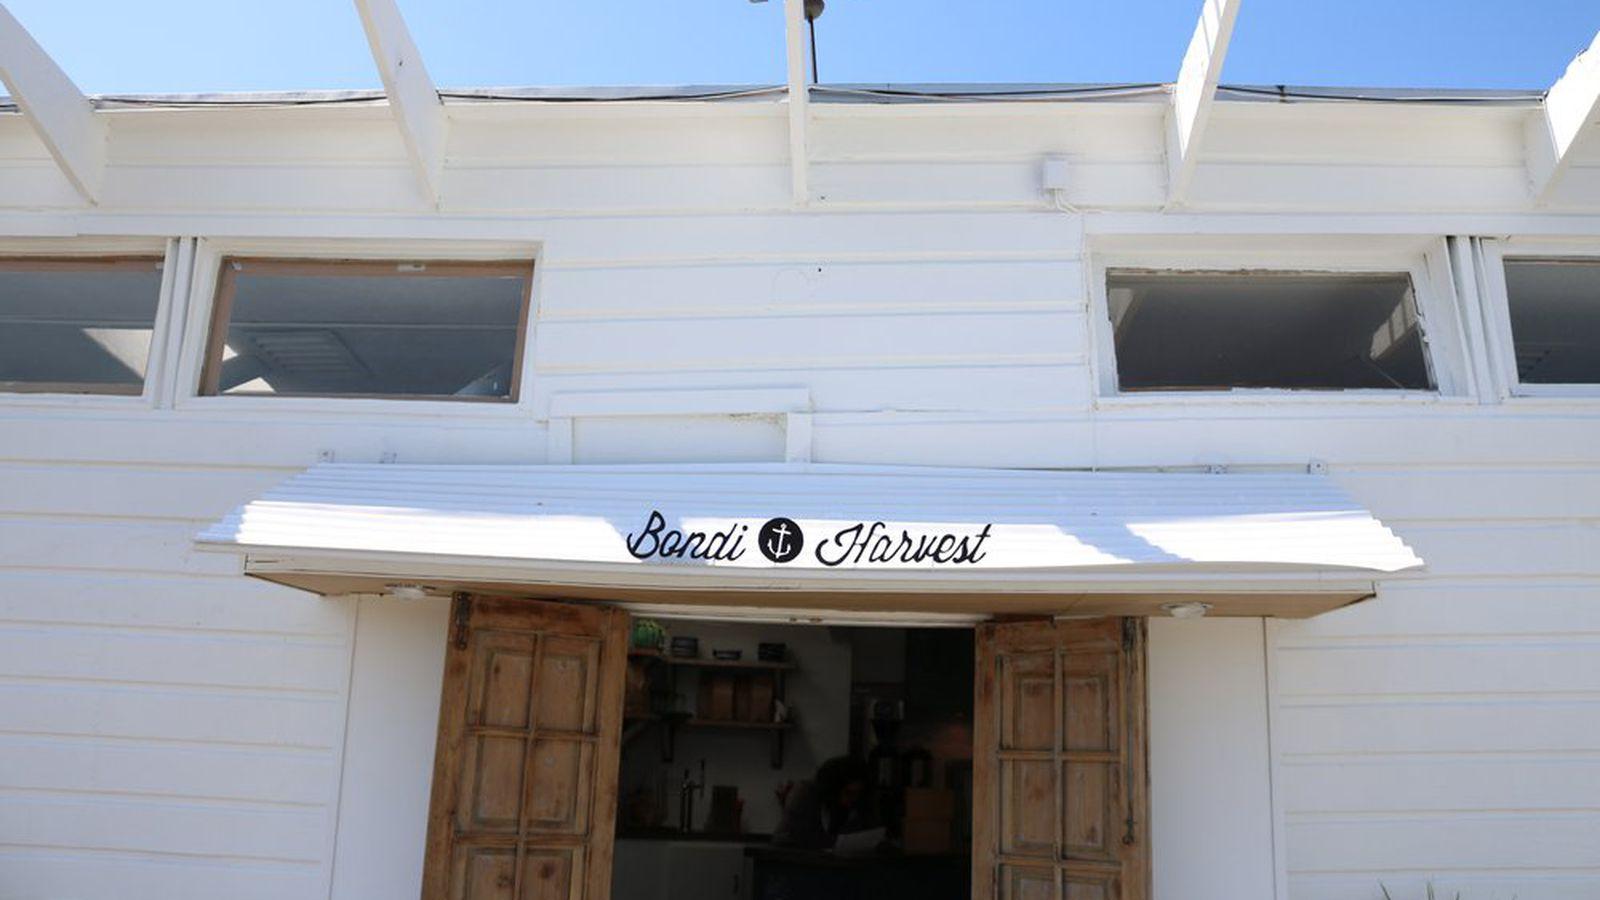 Olympic Cafe Menu San Diego